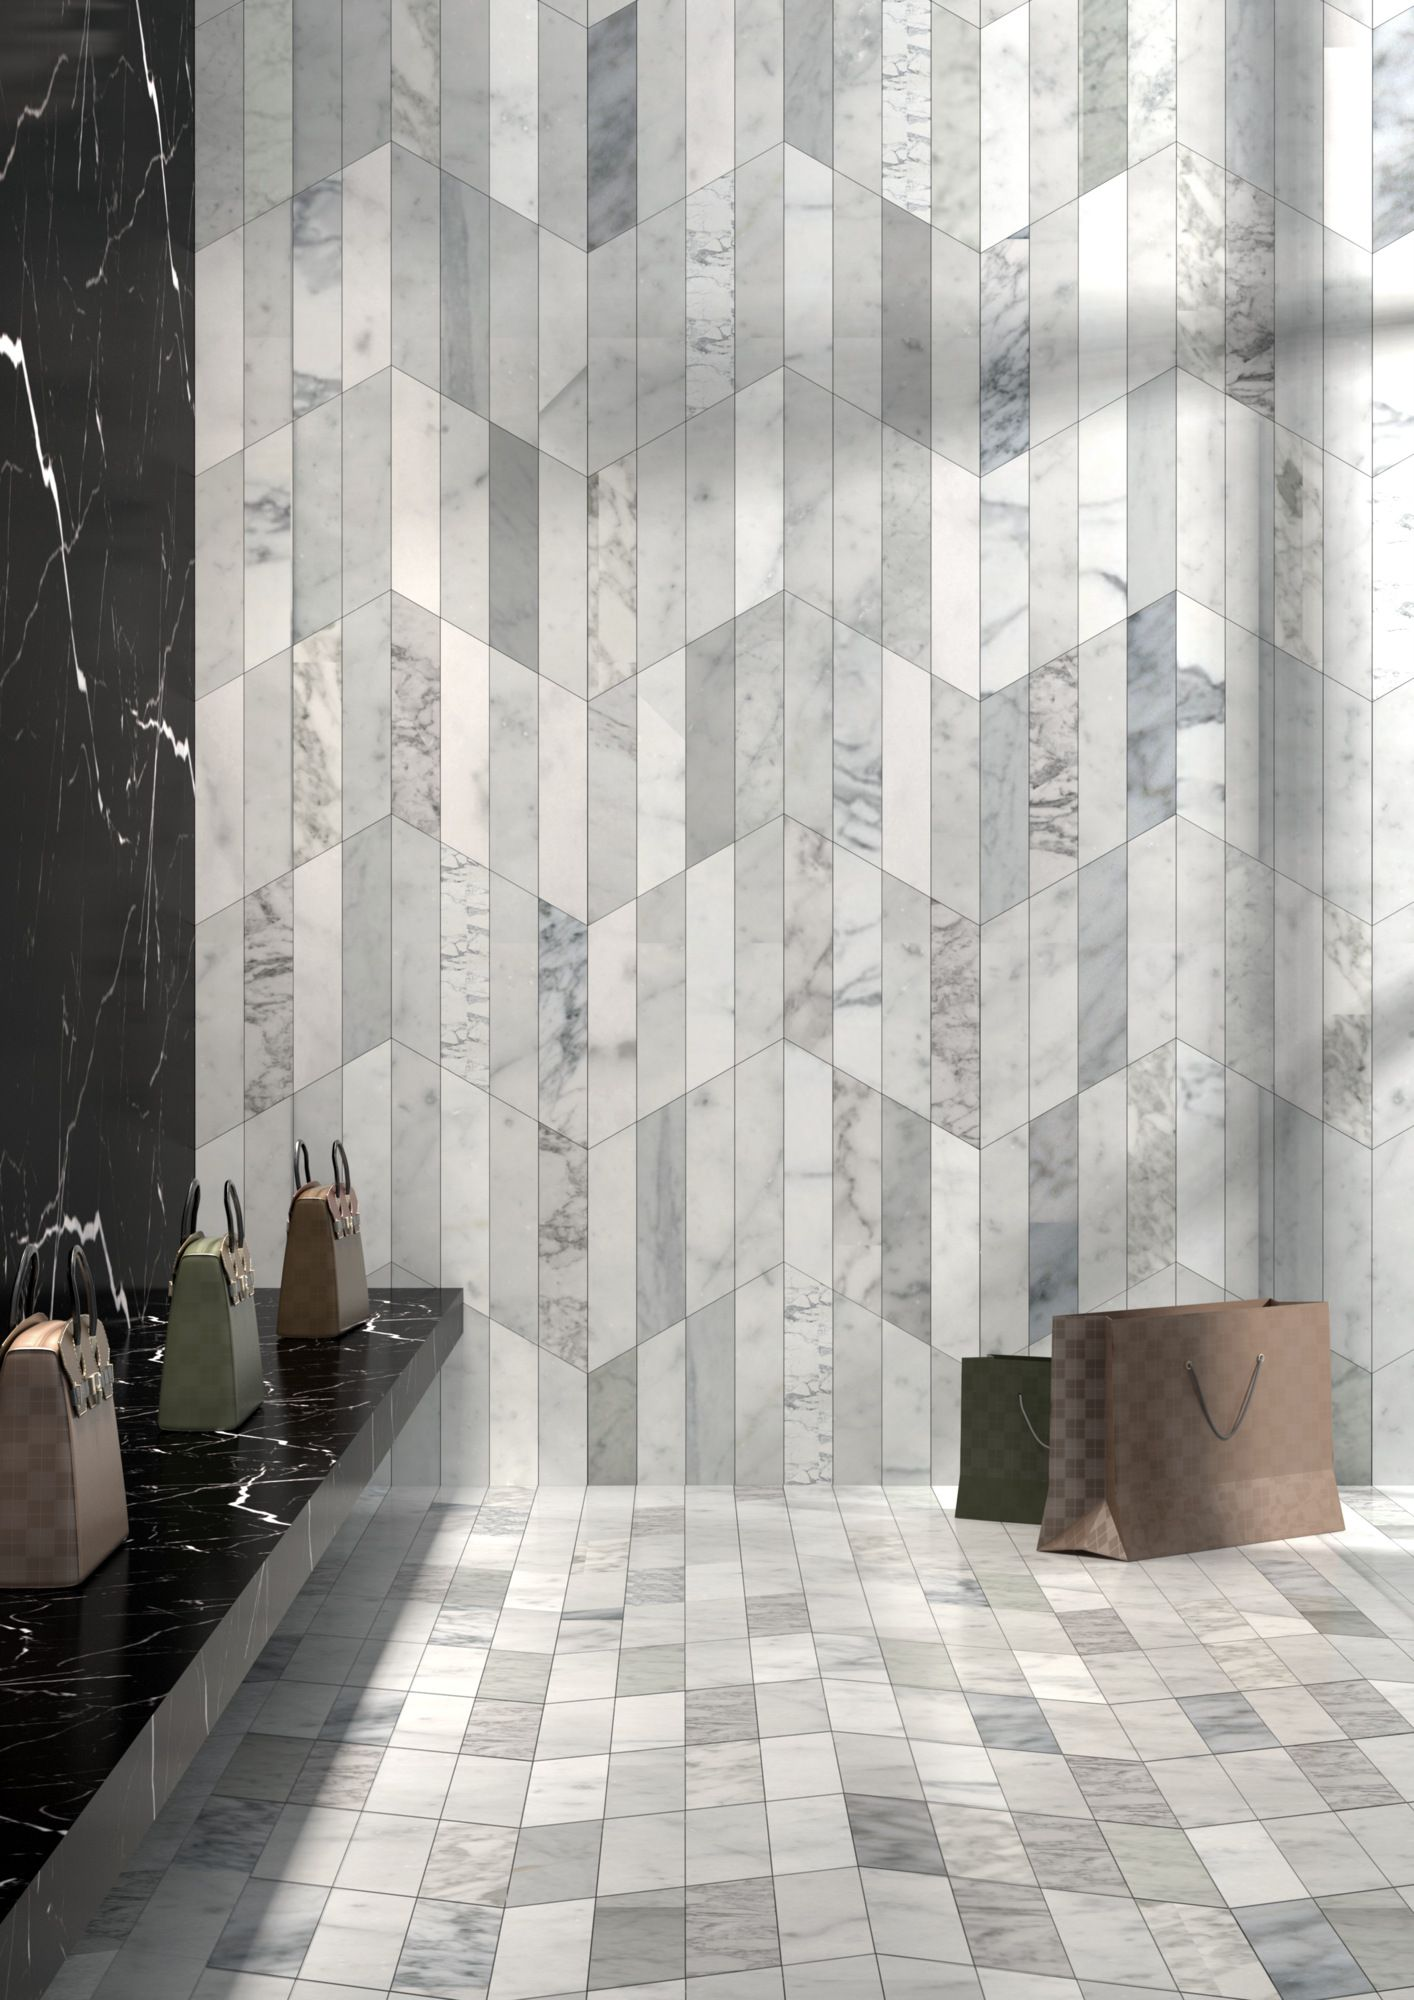 Marble Wall Floor Tiles Dedalo By Monitillo Marmi Design Claesson